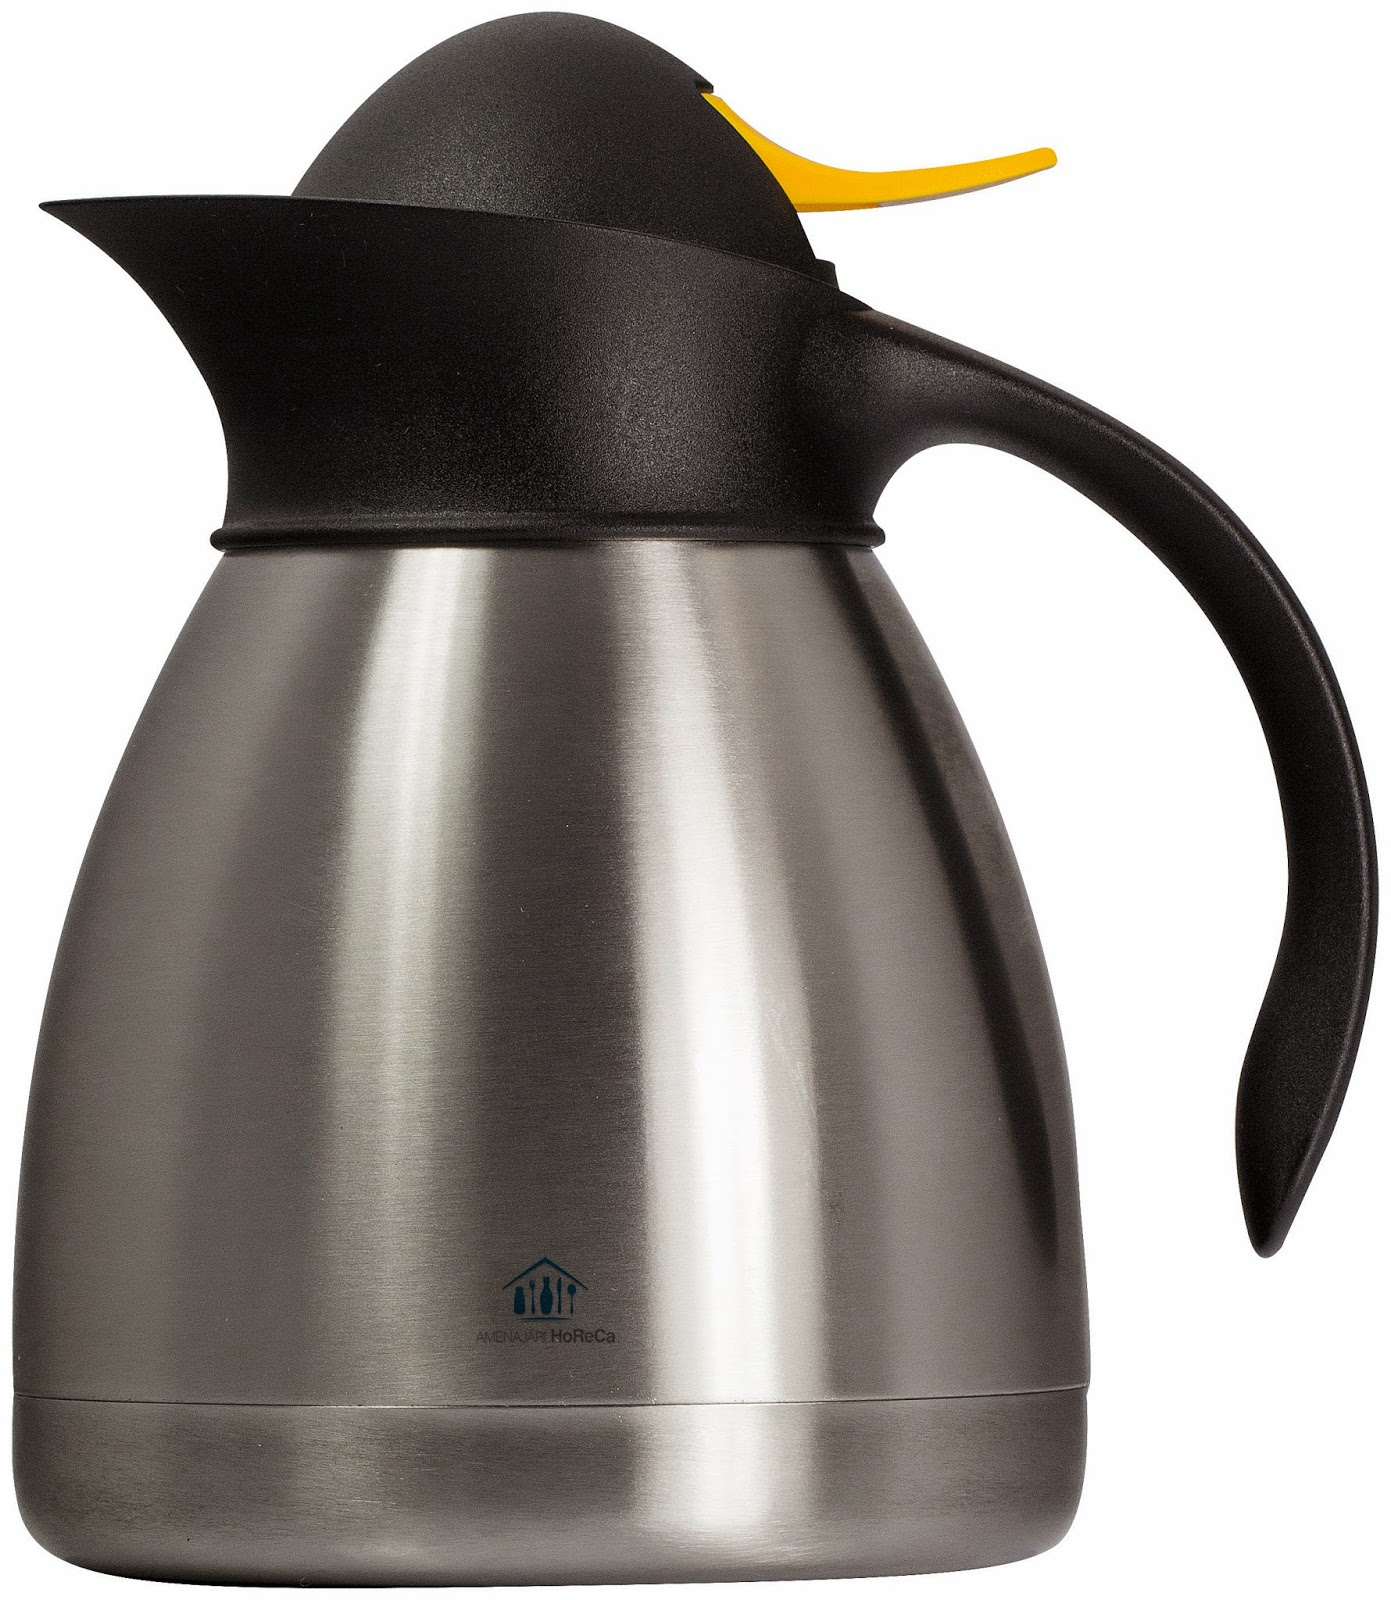 Termos Inox, Termos Pret, Cana Termos, Termos Cafea, Termosuri